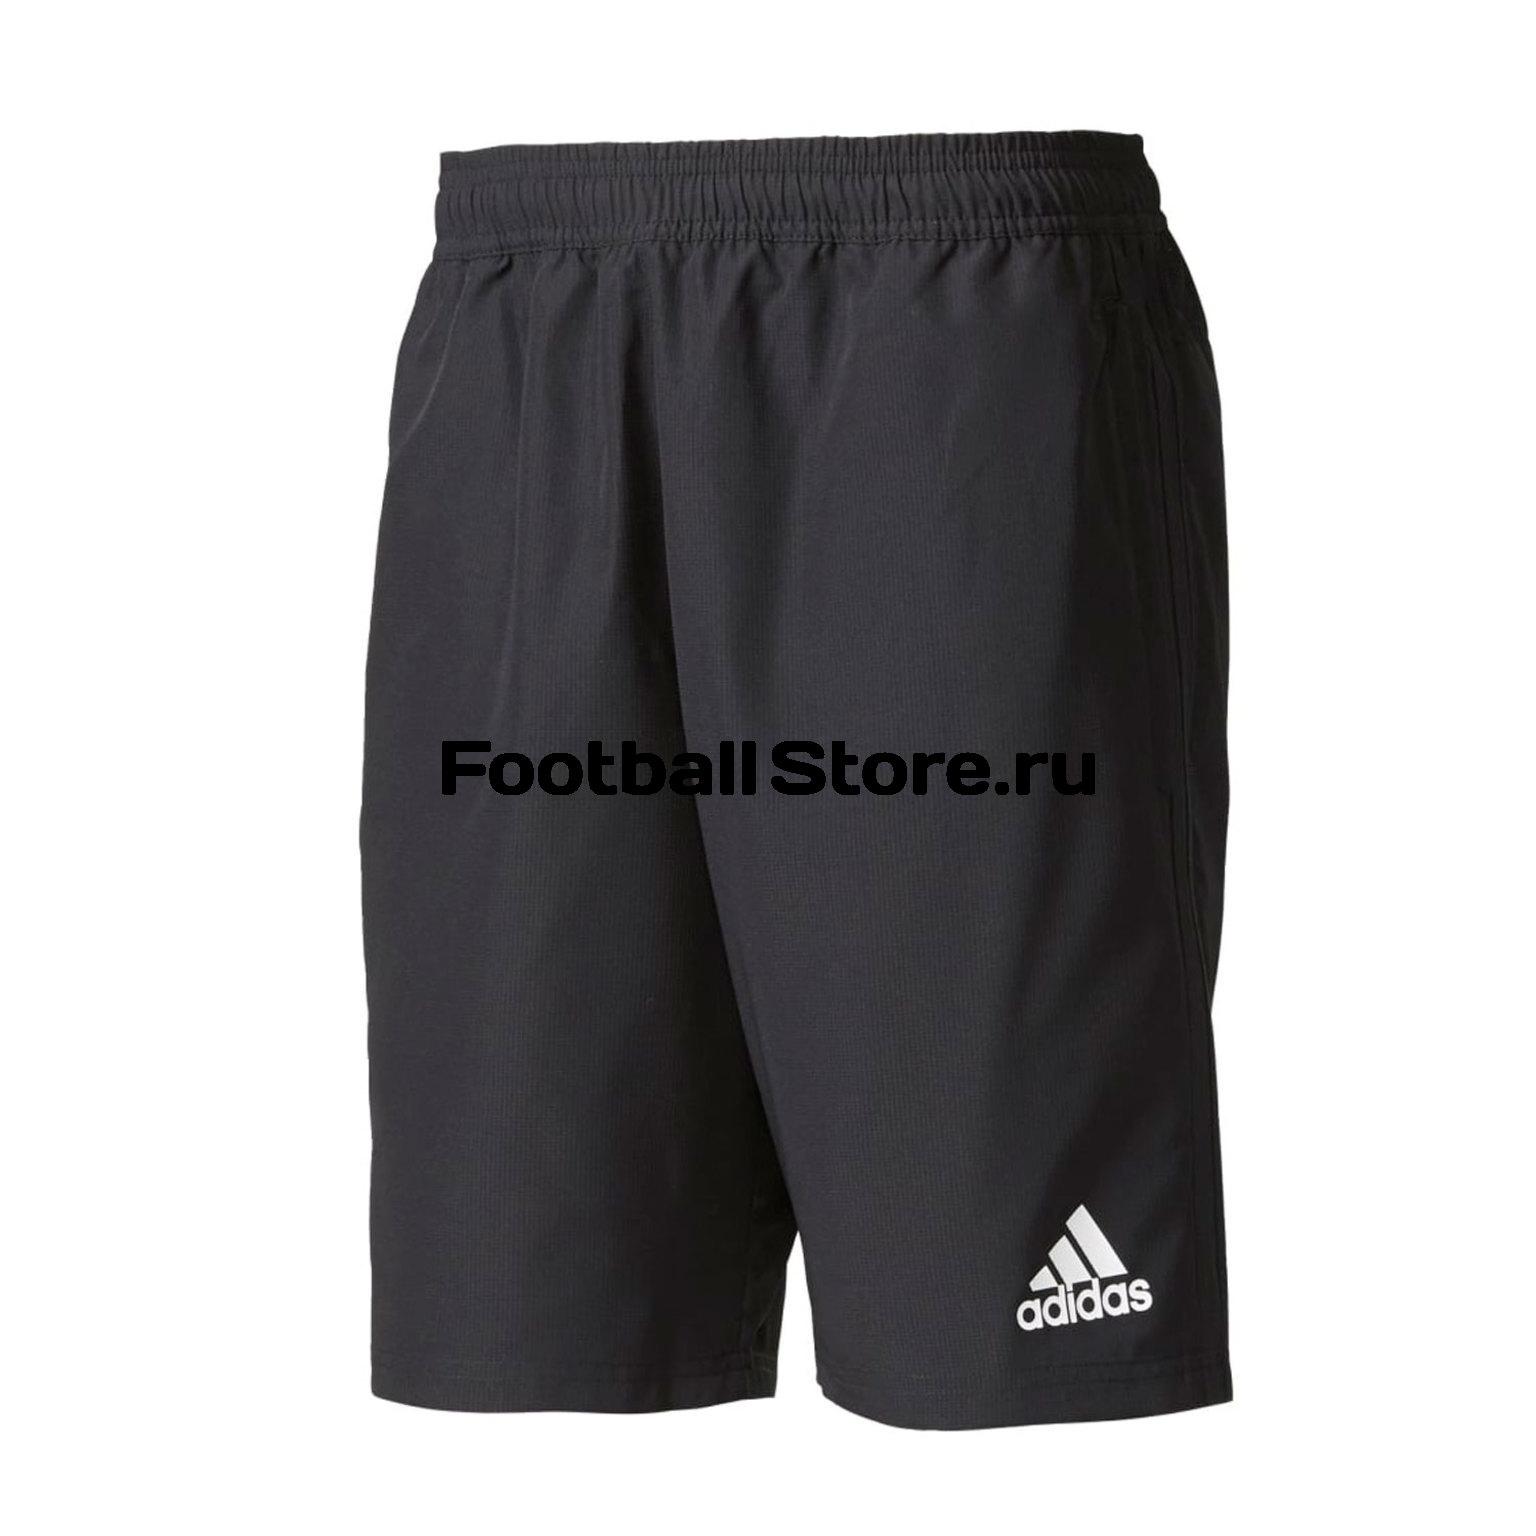 Шорты Adidas Tiro17 Wov Sho AY2891 шорты тренировочные adidas russia sho cf0563